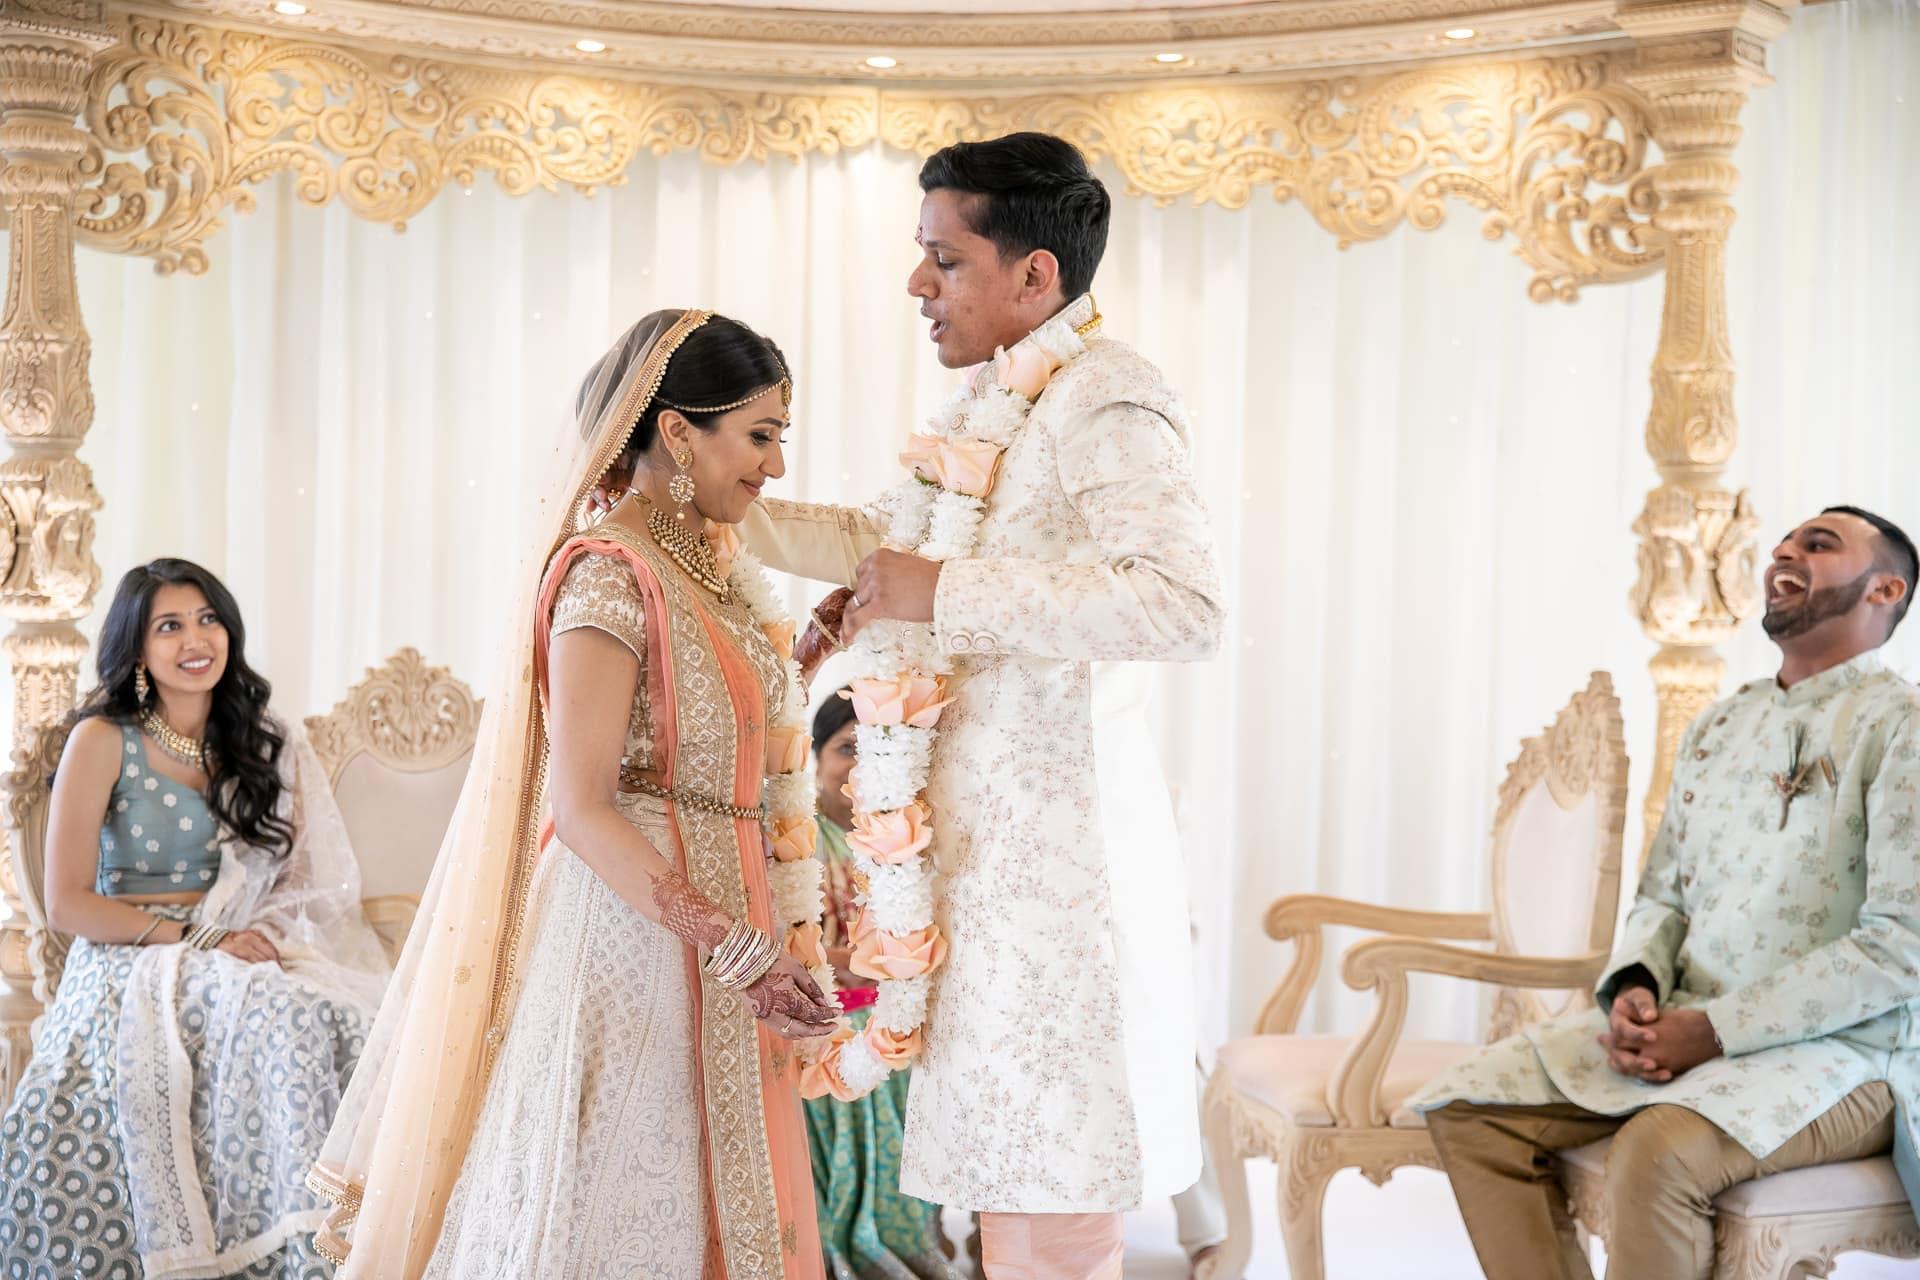 Bride and groom garlanding ceremony